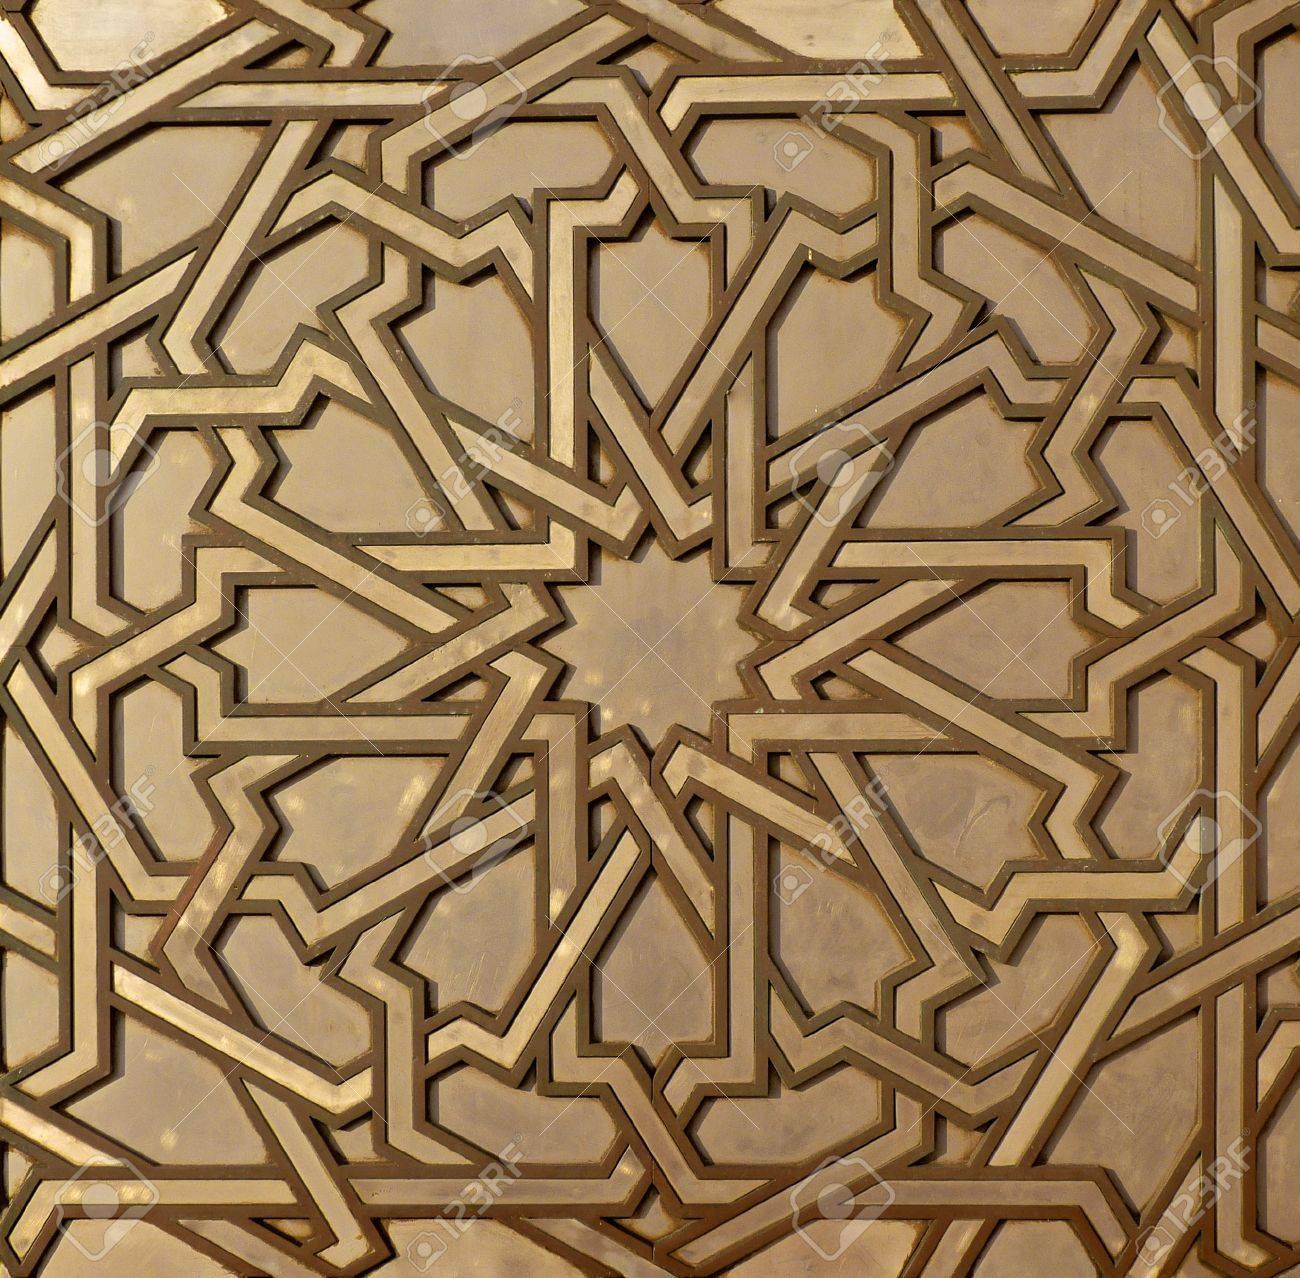 L'istick Pico 2 d'Eleaf : le retour de la Pico 18684662-dessin-arabesque-marocain-sur-les-portes-de-la-mosqu%C3%A9e-hassan-ii-%C3%A0-casablanca-maroc